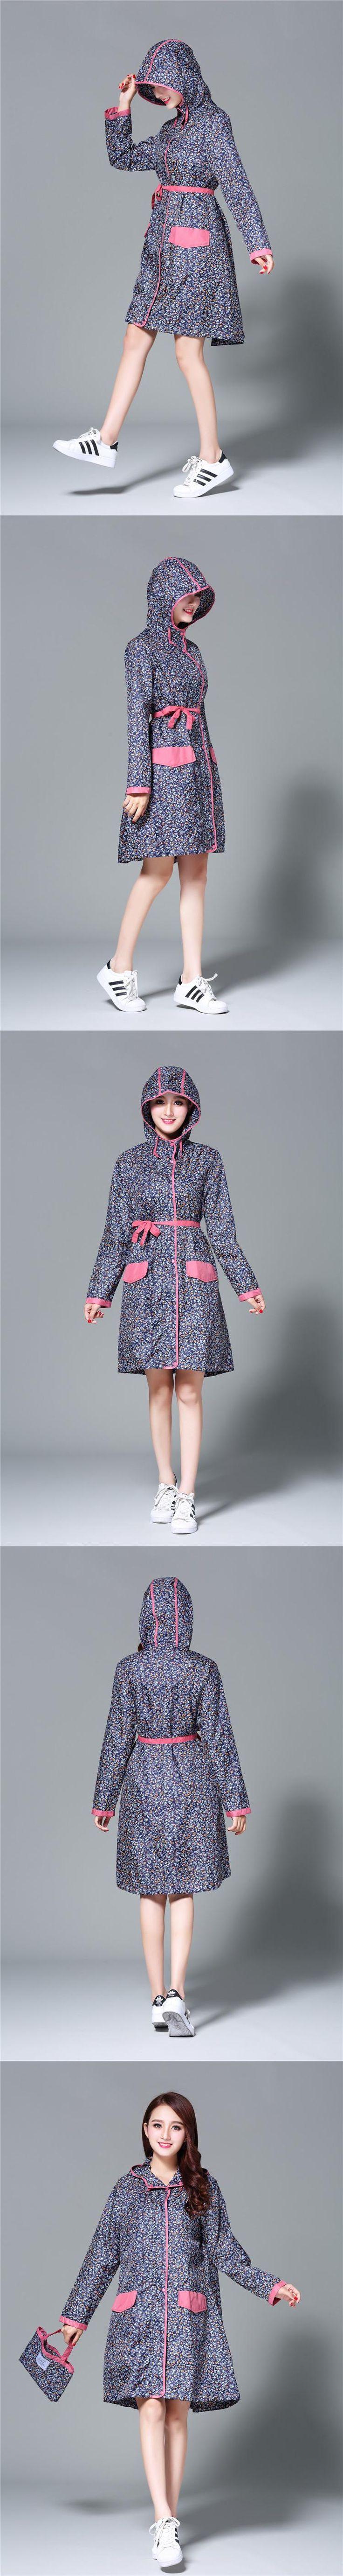 thin flower long Raincoats women poncho waterproof,Outdoors Rain Ponchos Coat Jackets Female Chubasqueros Muje with belt